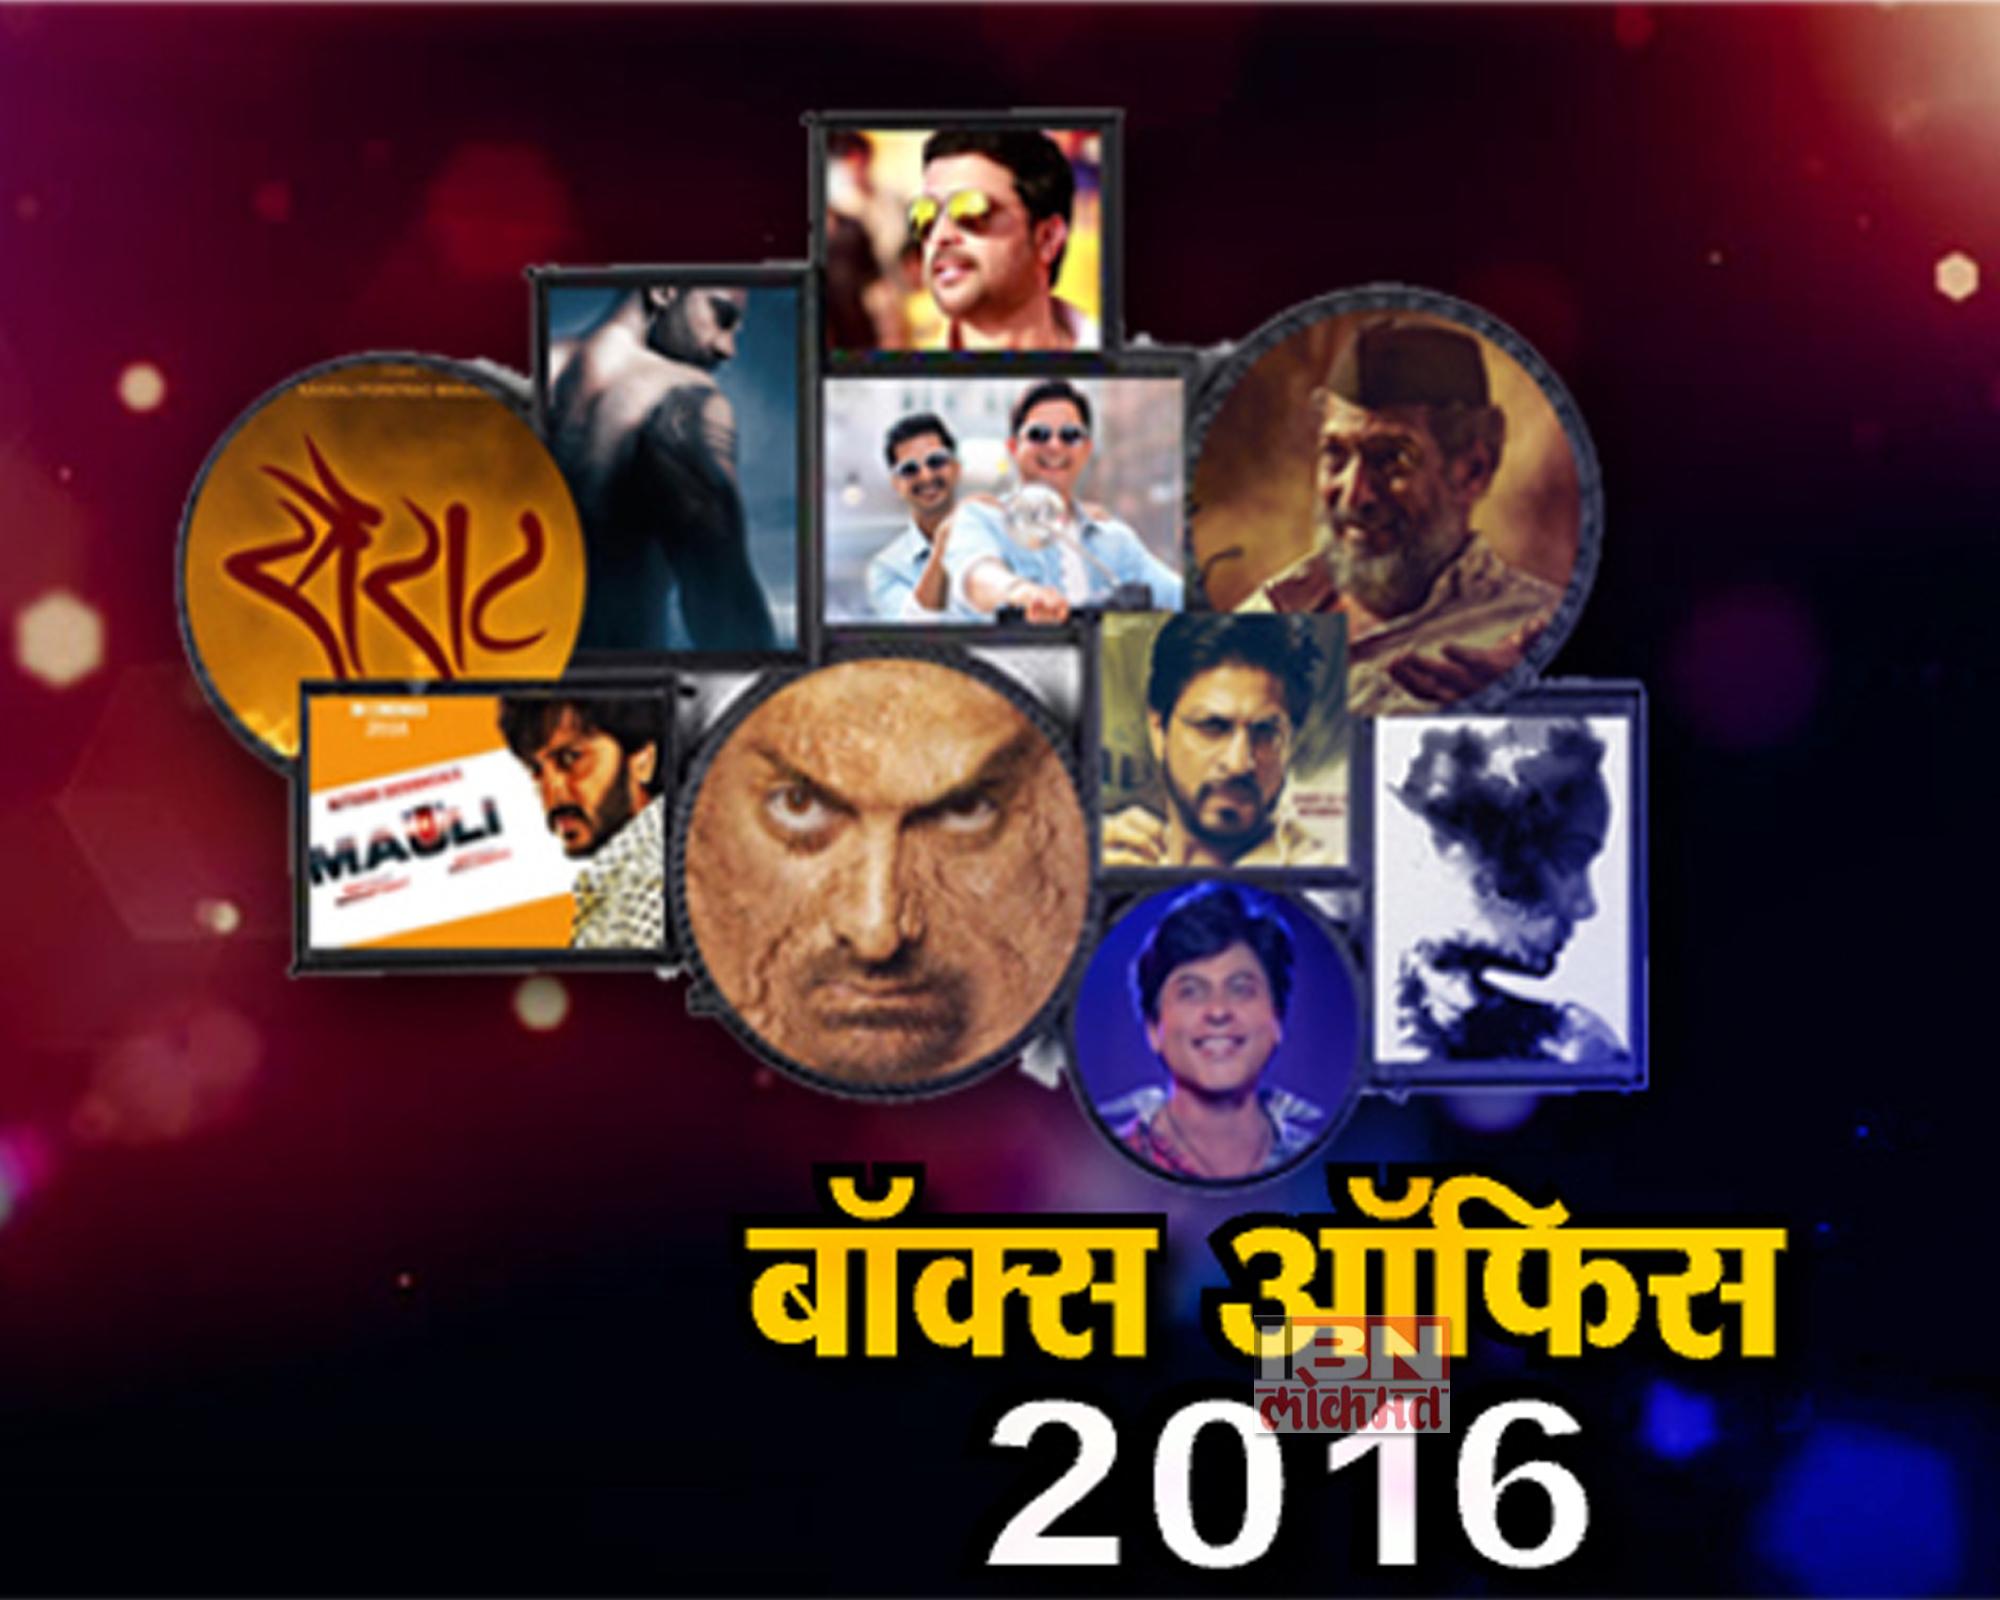 Kapoor And Sons 2016 Hindi Movie Mp3 Song Downloadpng